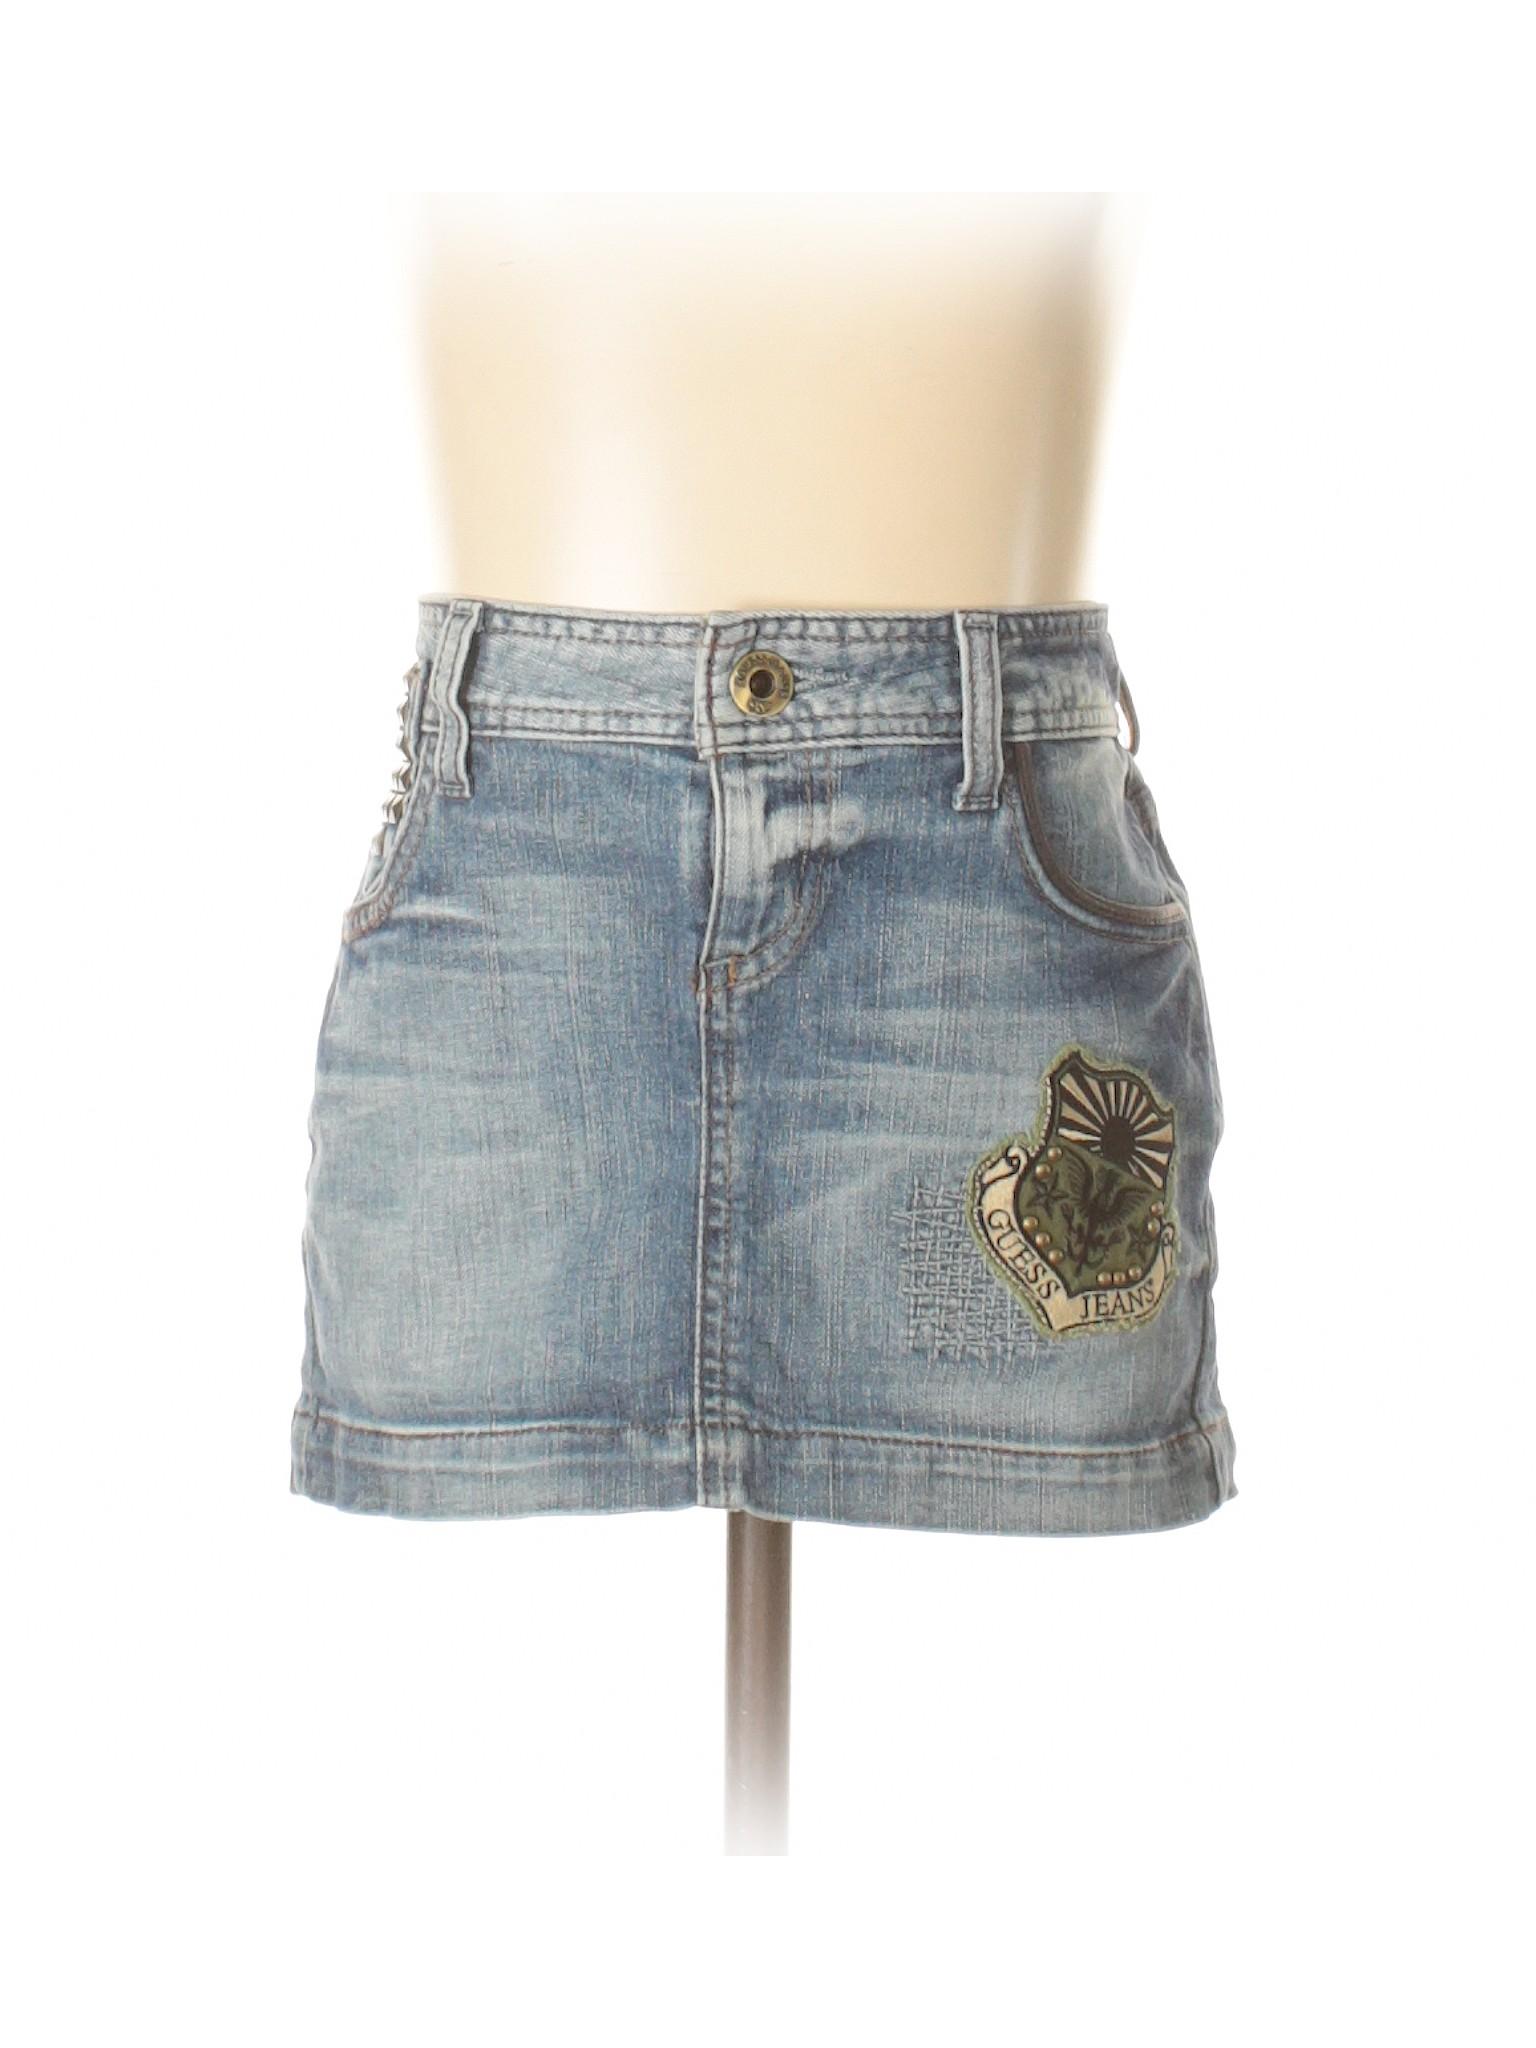 Skirt Boutique Boutique Guess Guess Skirt Boutique Denim Guess Denim Skirt Denim afq7vv